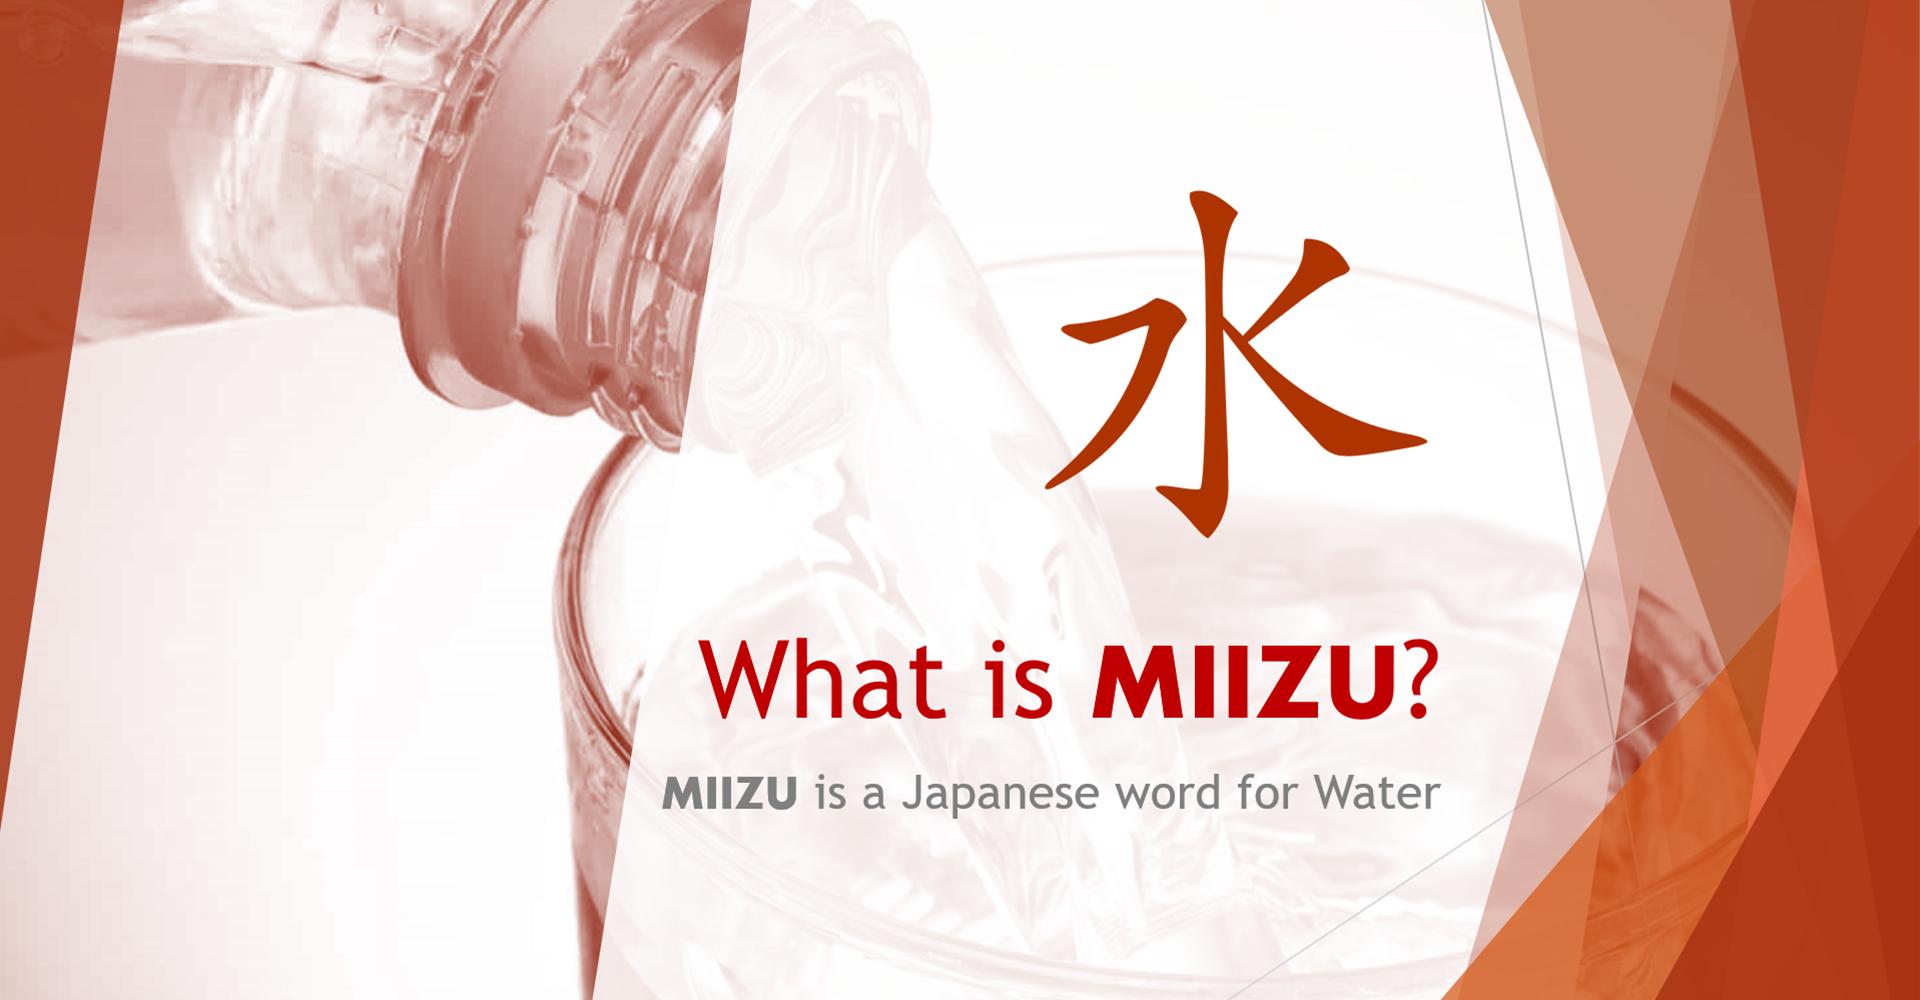 What is Miizu?